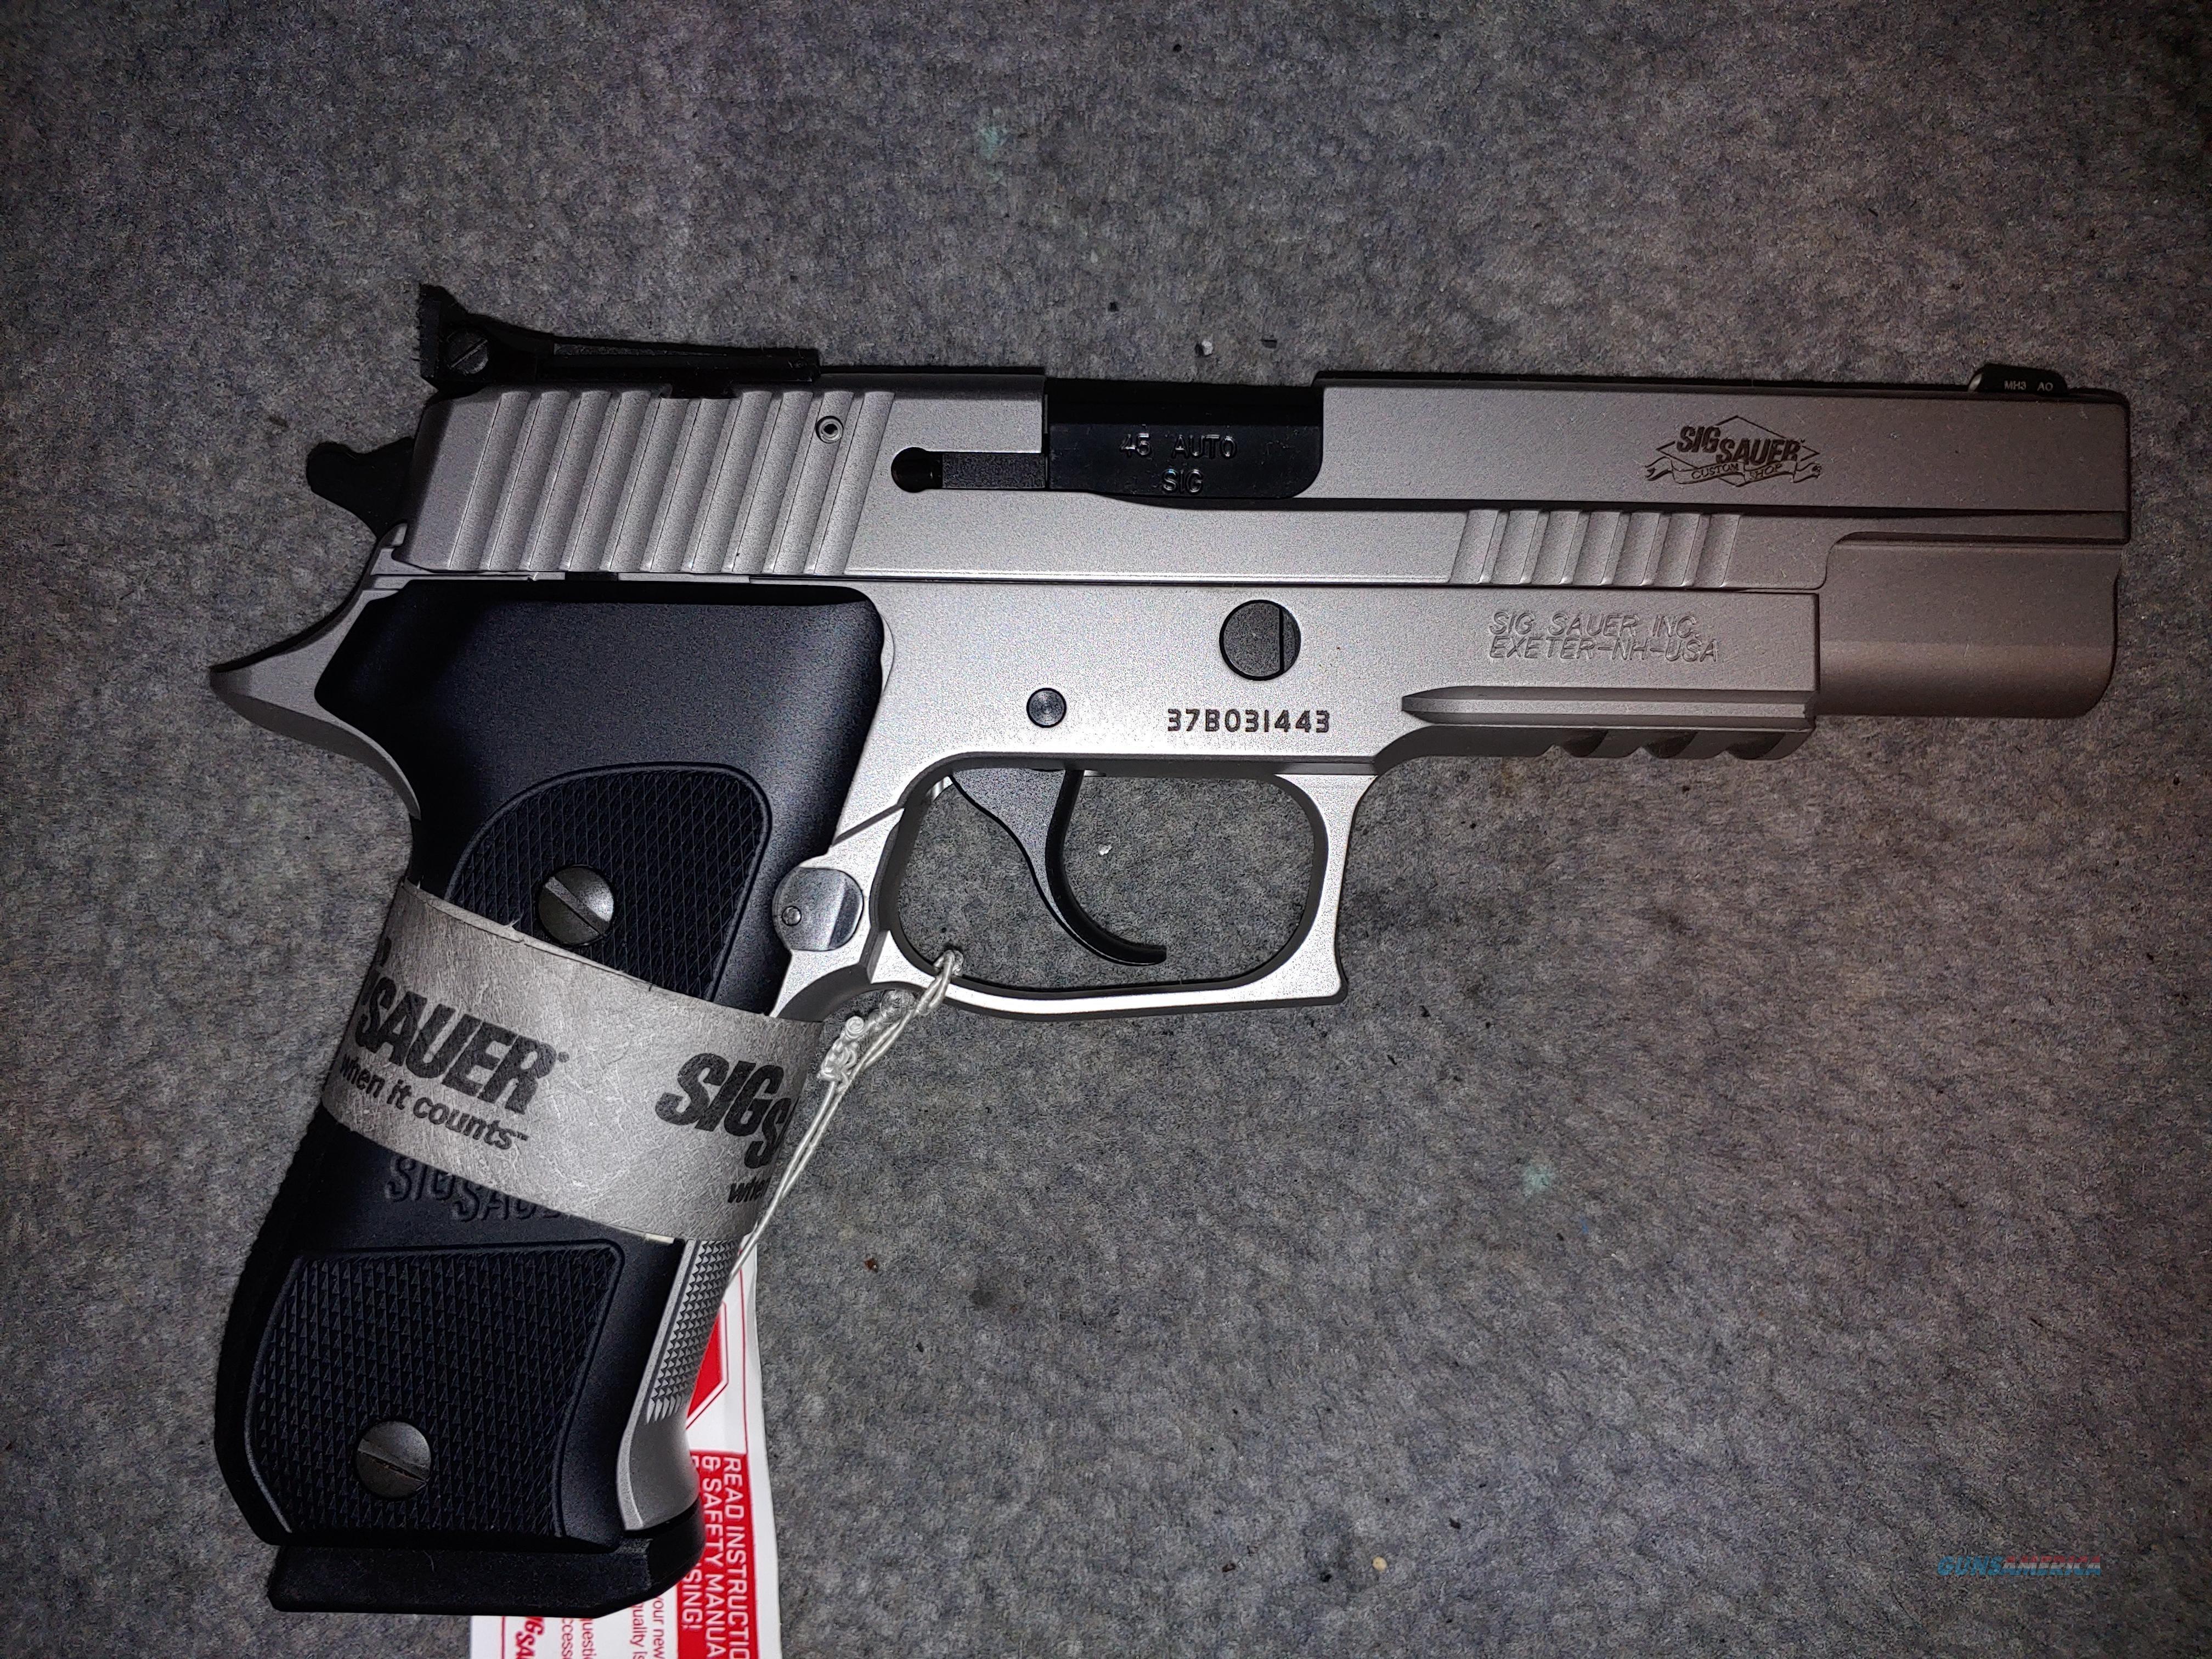 Sig P220 custom  Guns > Pistols > Sig - Sauer/Sigarms Pistols > P220